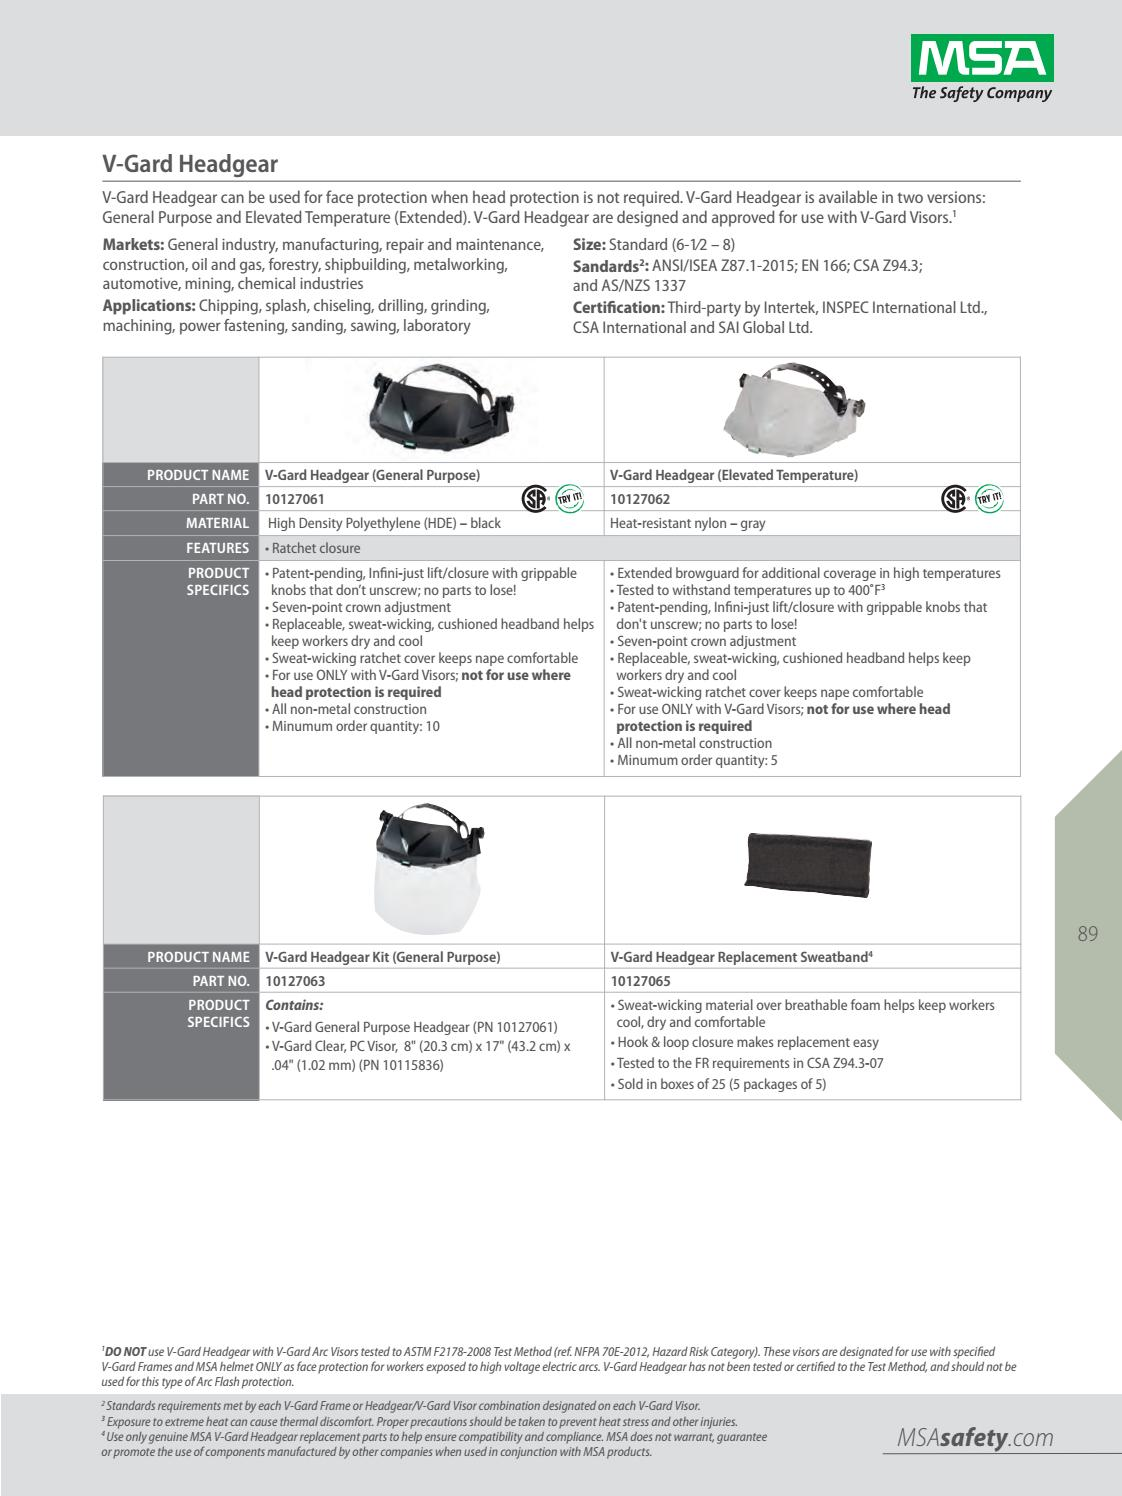 Standard 641817040034 MSA 10127063 V-Gard Headgear for Elevated Temperature